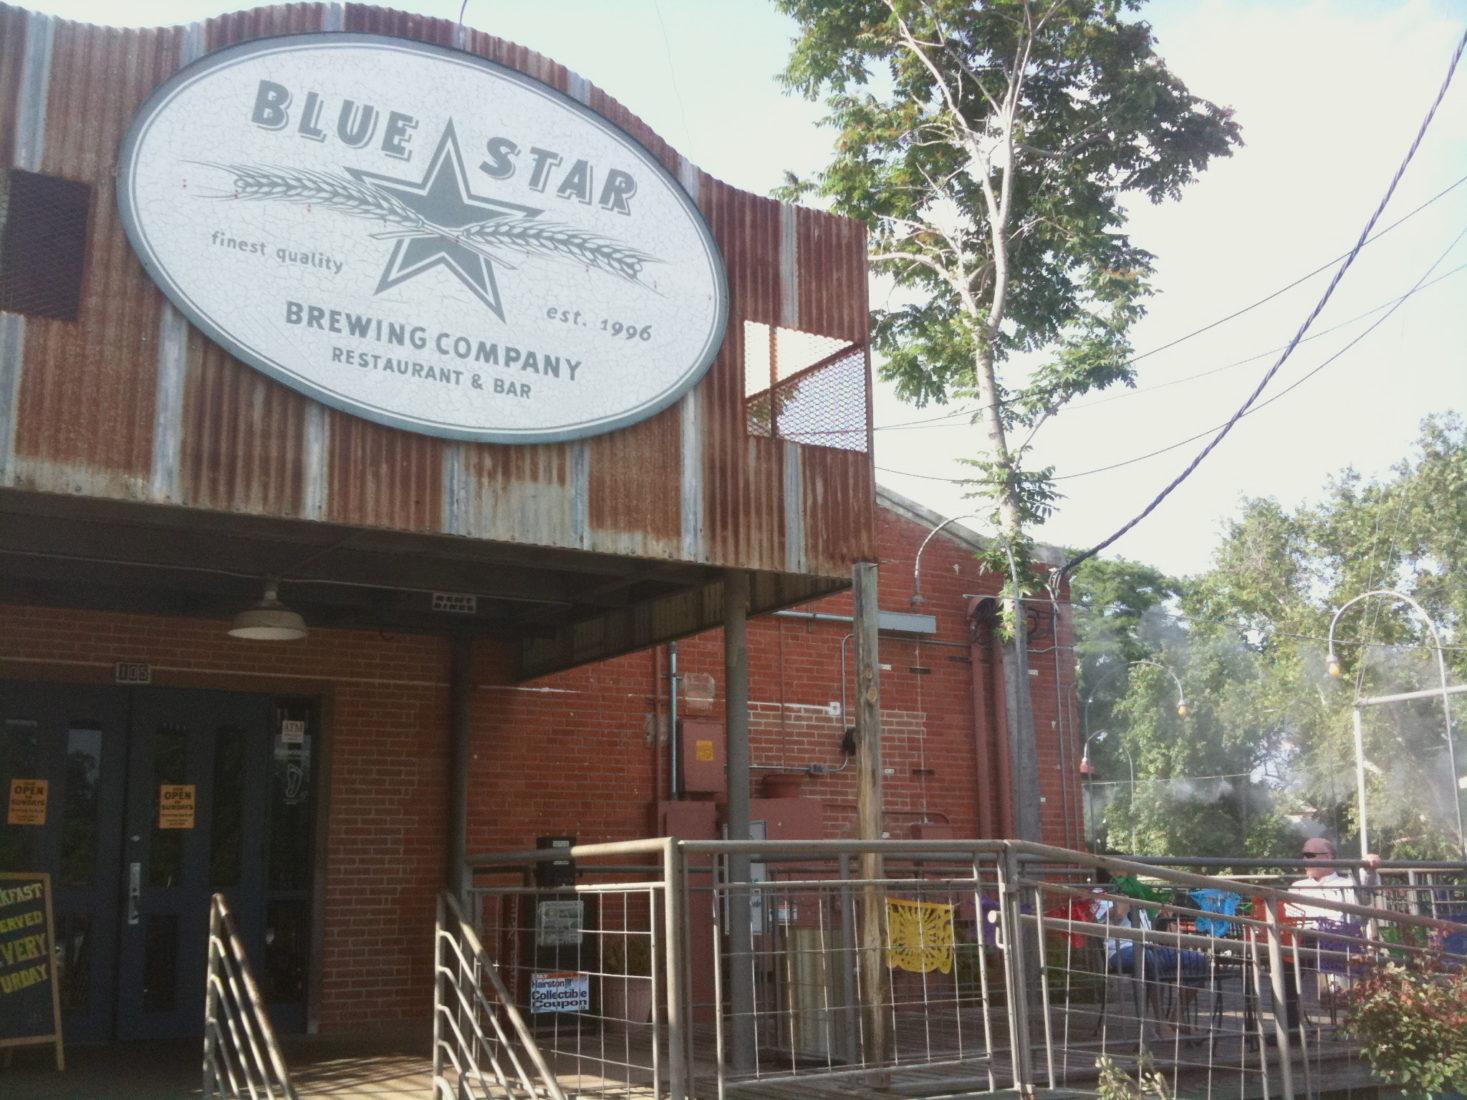 91. Blue Star Brewery, San Antonio, TX 2010